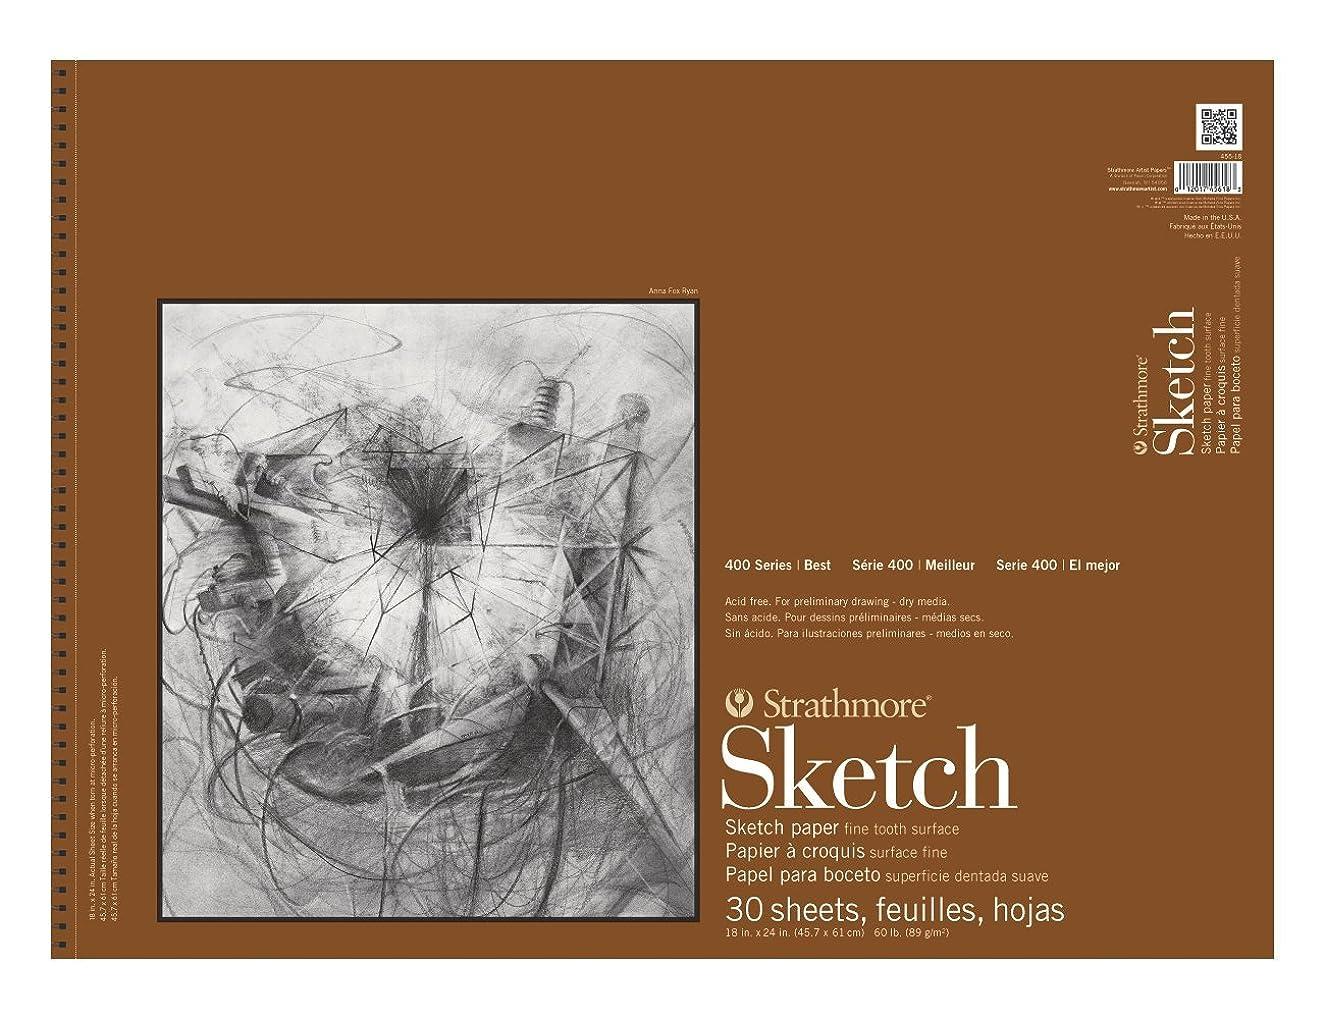 Strathmore 455-18 Strath Sketch S 400 18X24 30SHT 60LBS, 18